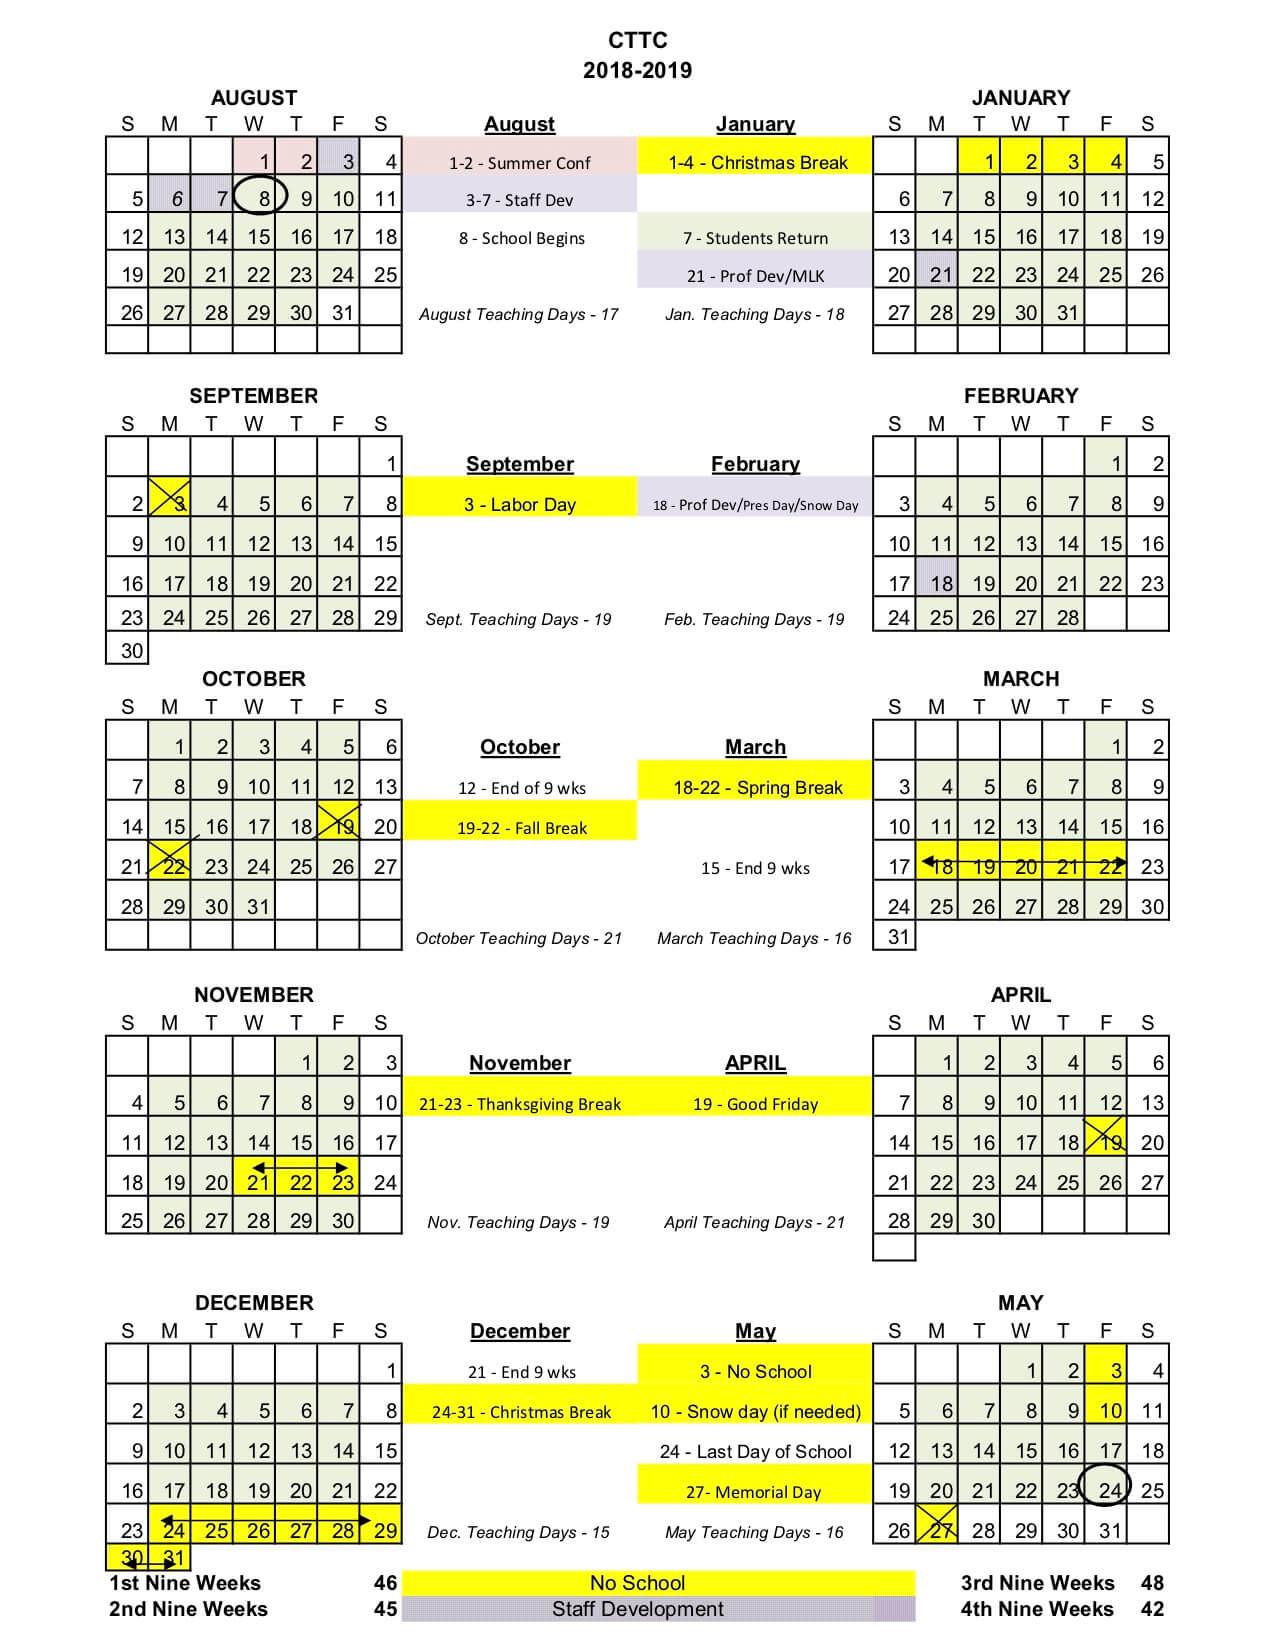 CTTC Calendar